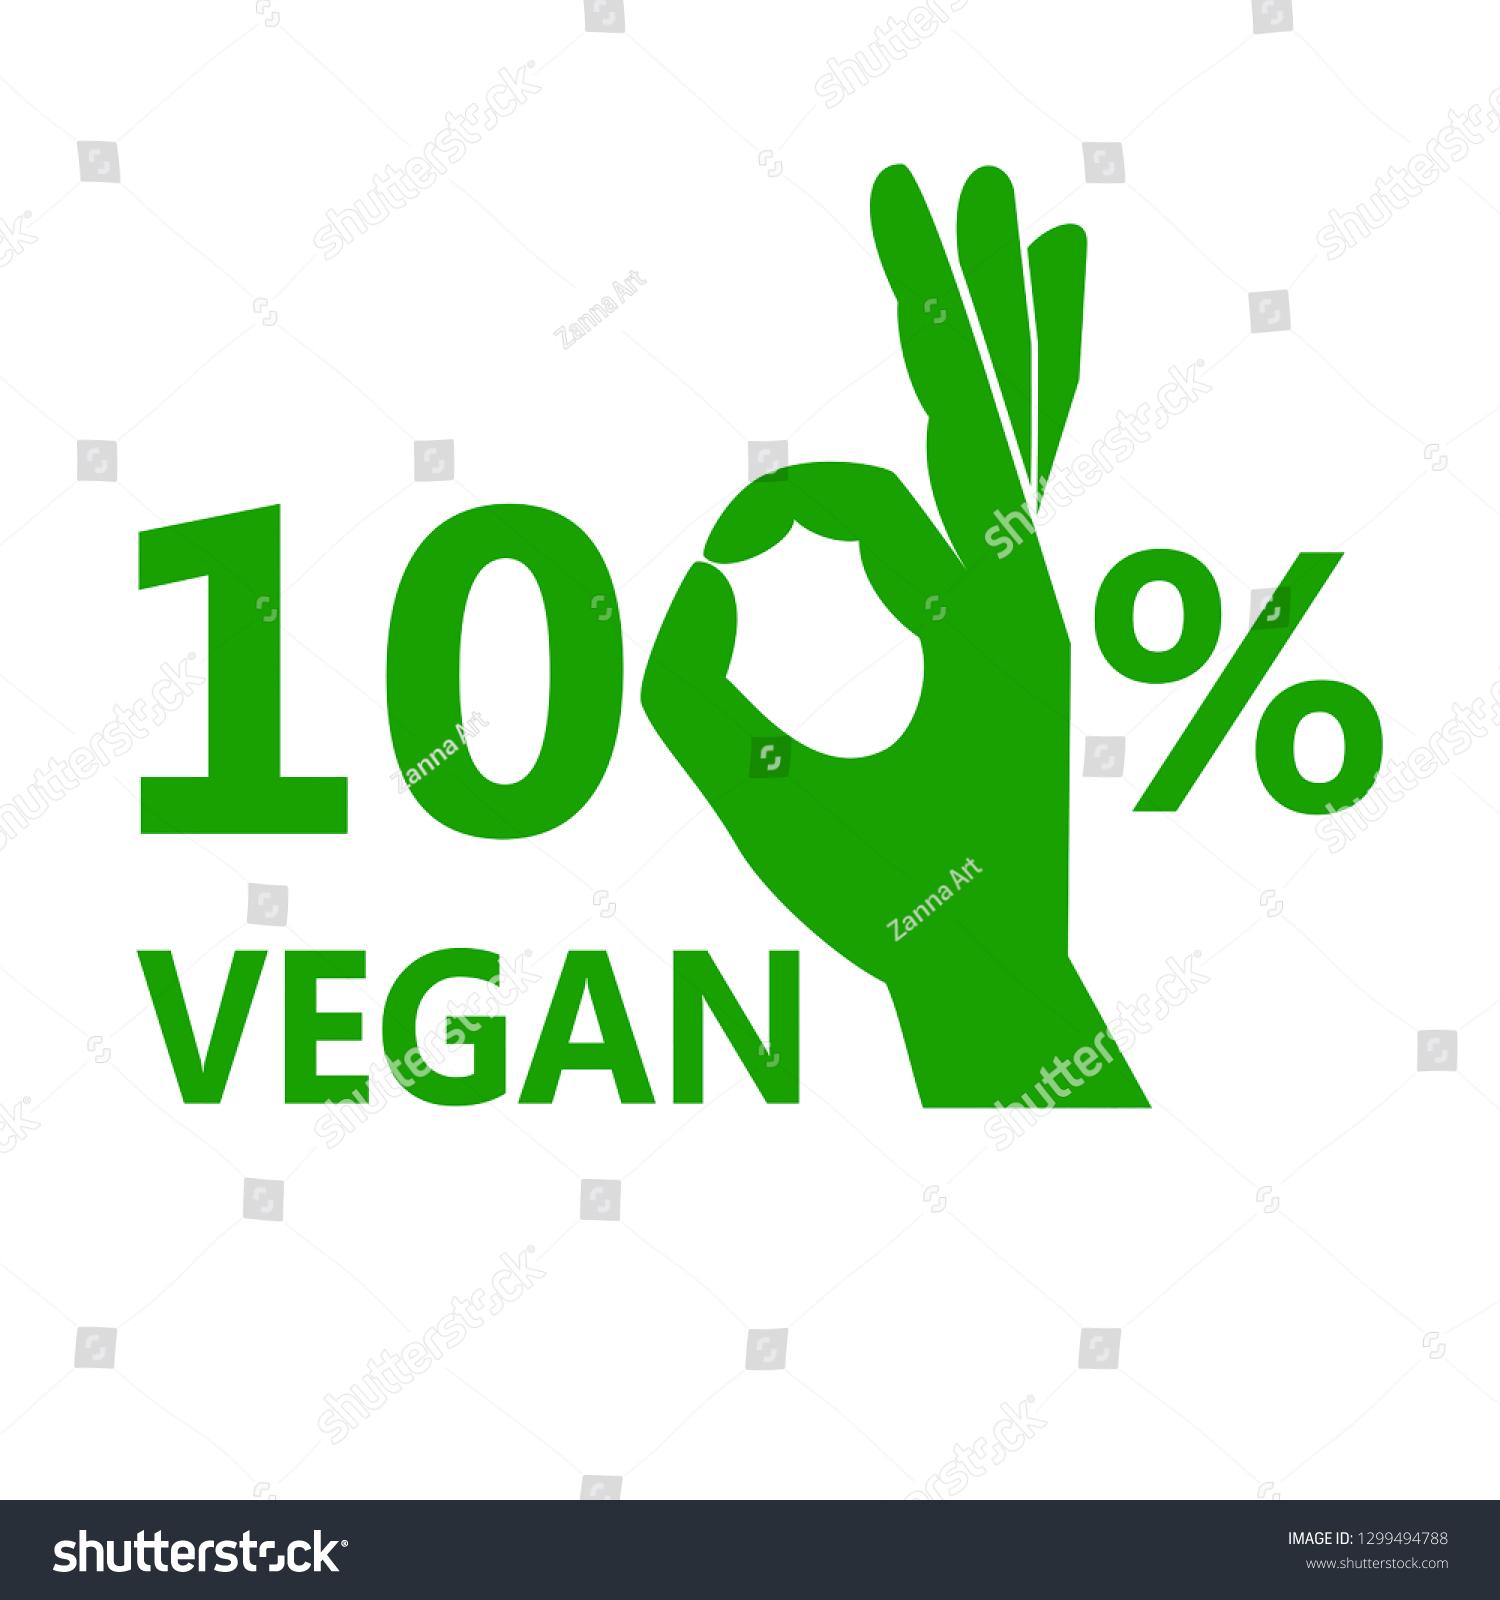 100 Vegan Vector Icon Stock Vector (Royalty Free) 1299494788